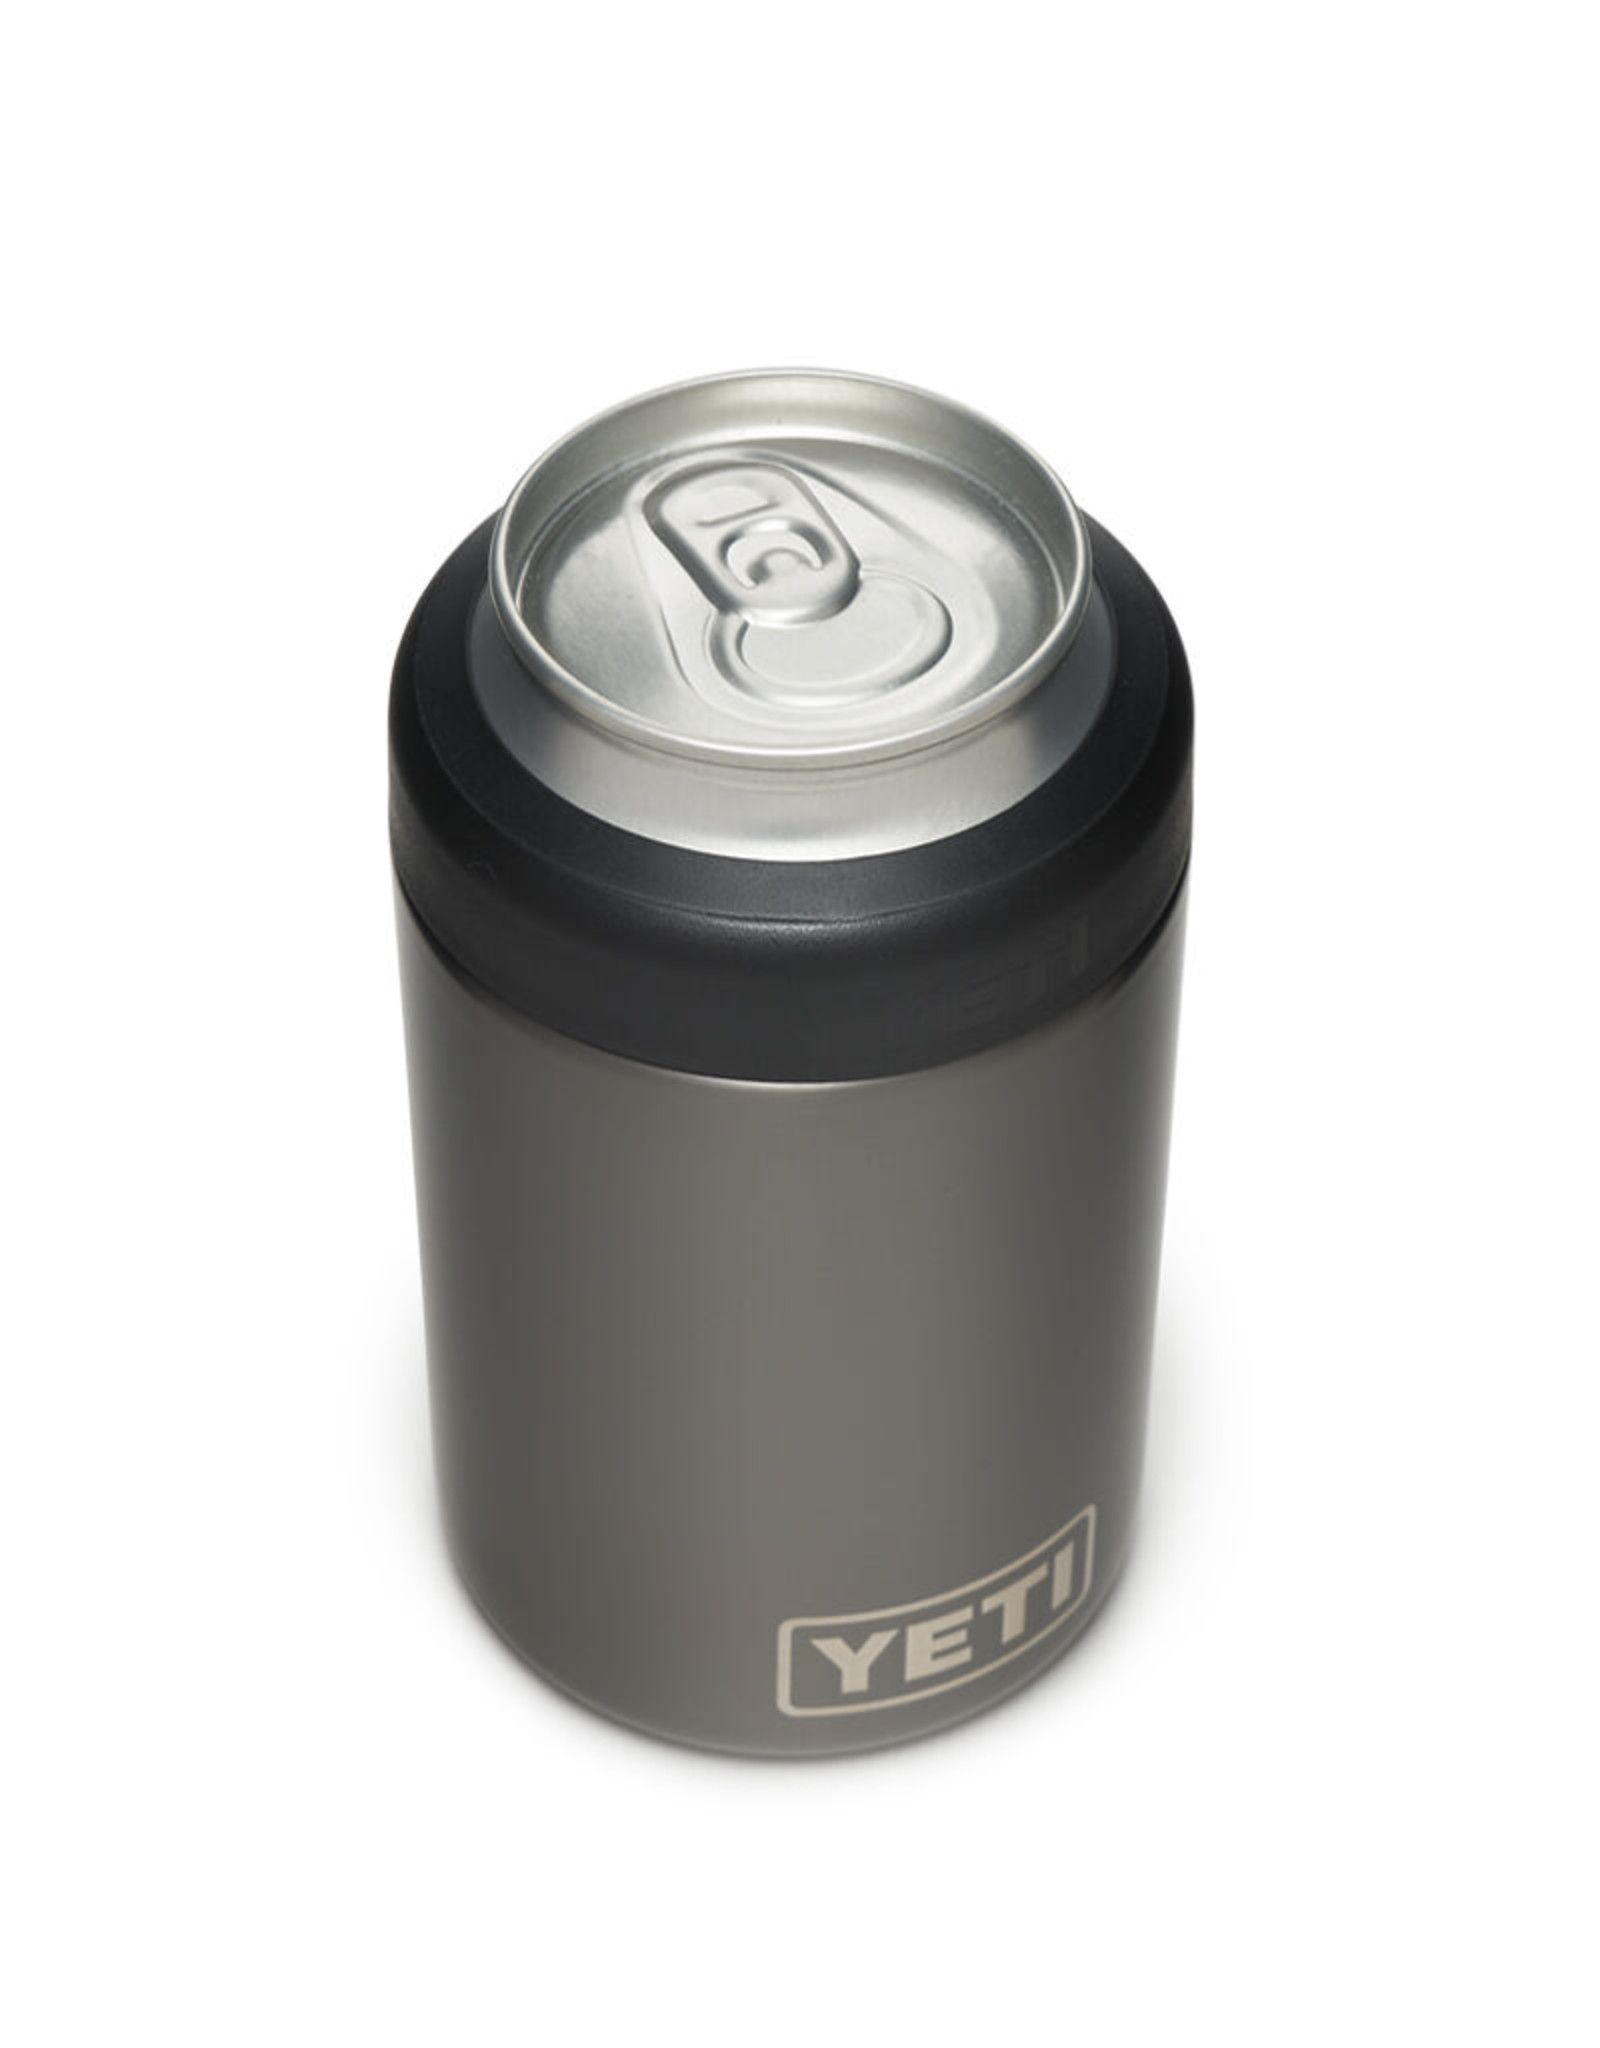 YETI Coolers Colster 2.0 - Graphite